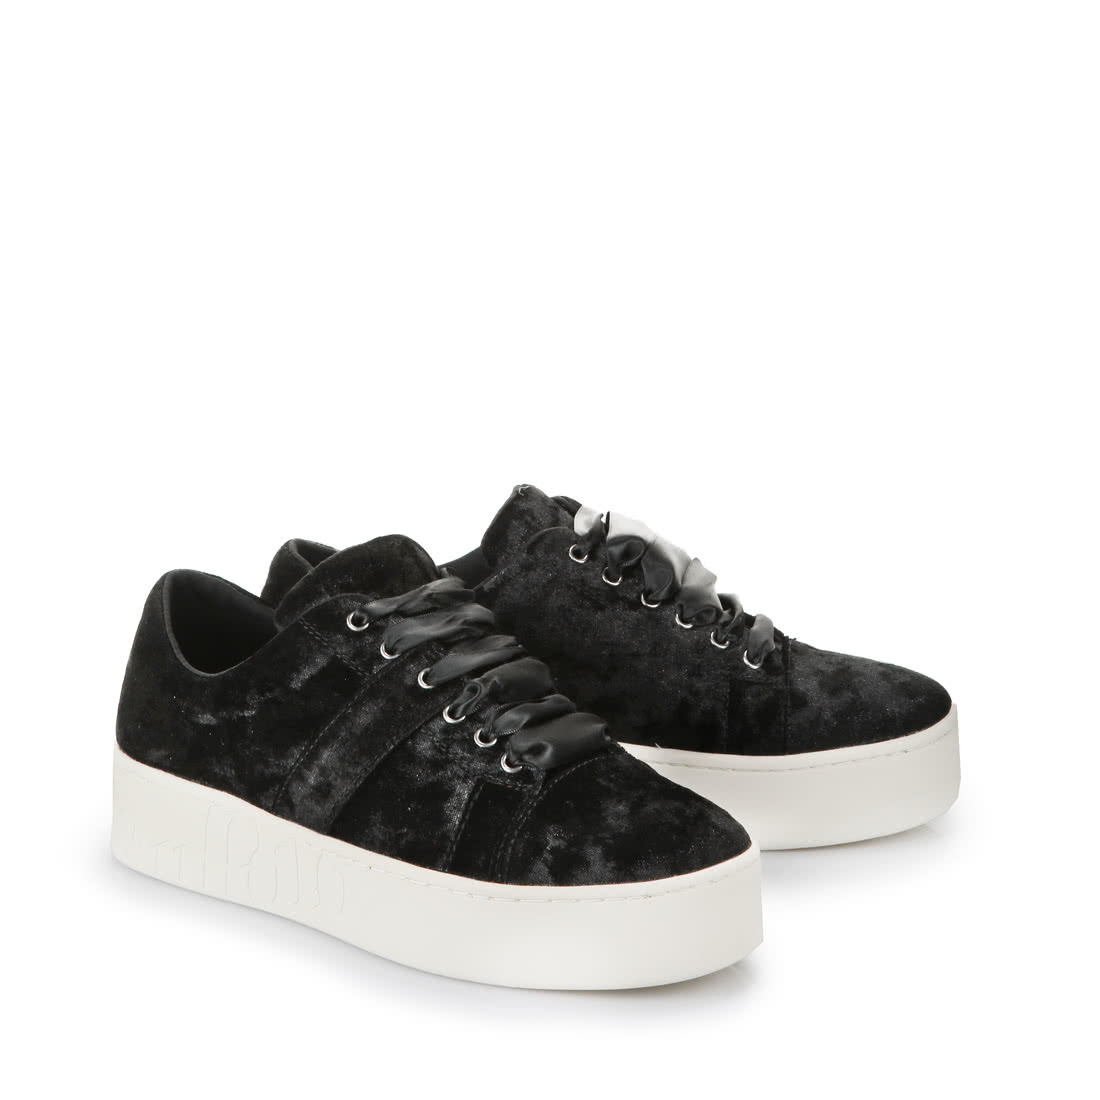 san francisco eccb7 855eb Buffalo Plateau-Sneaker in schwarz aus Samt online kaufen ...